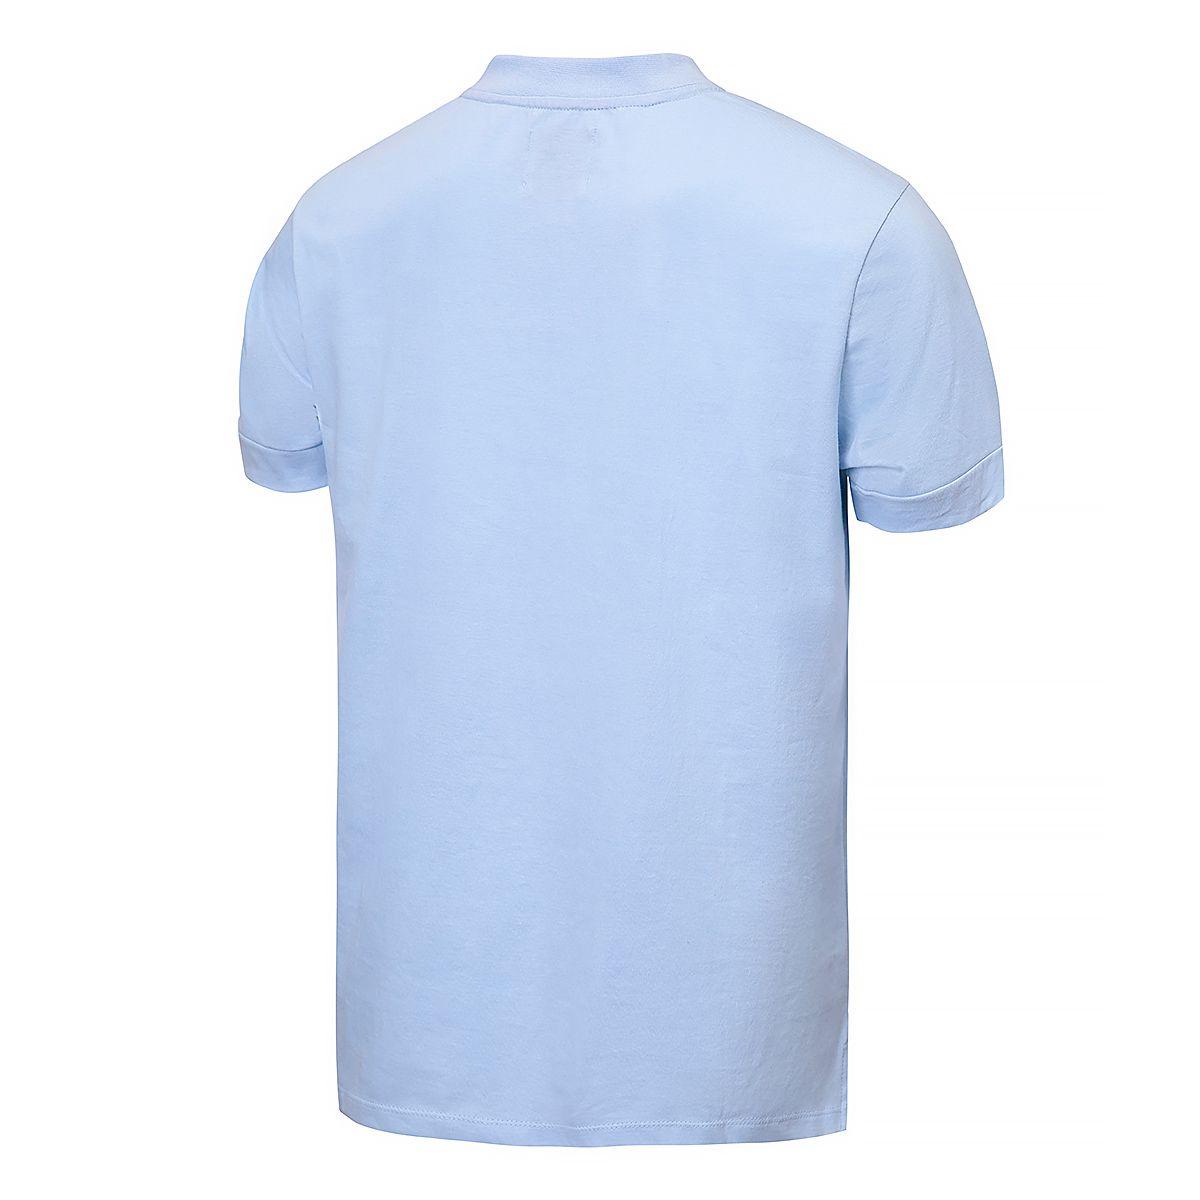 Camisa Uruguai Retrô Corda 1930